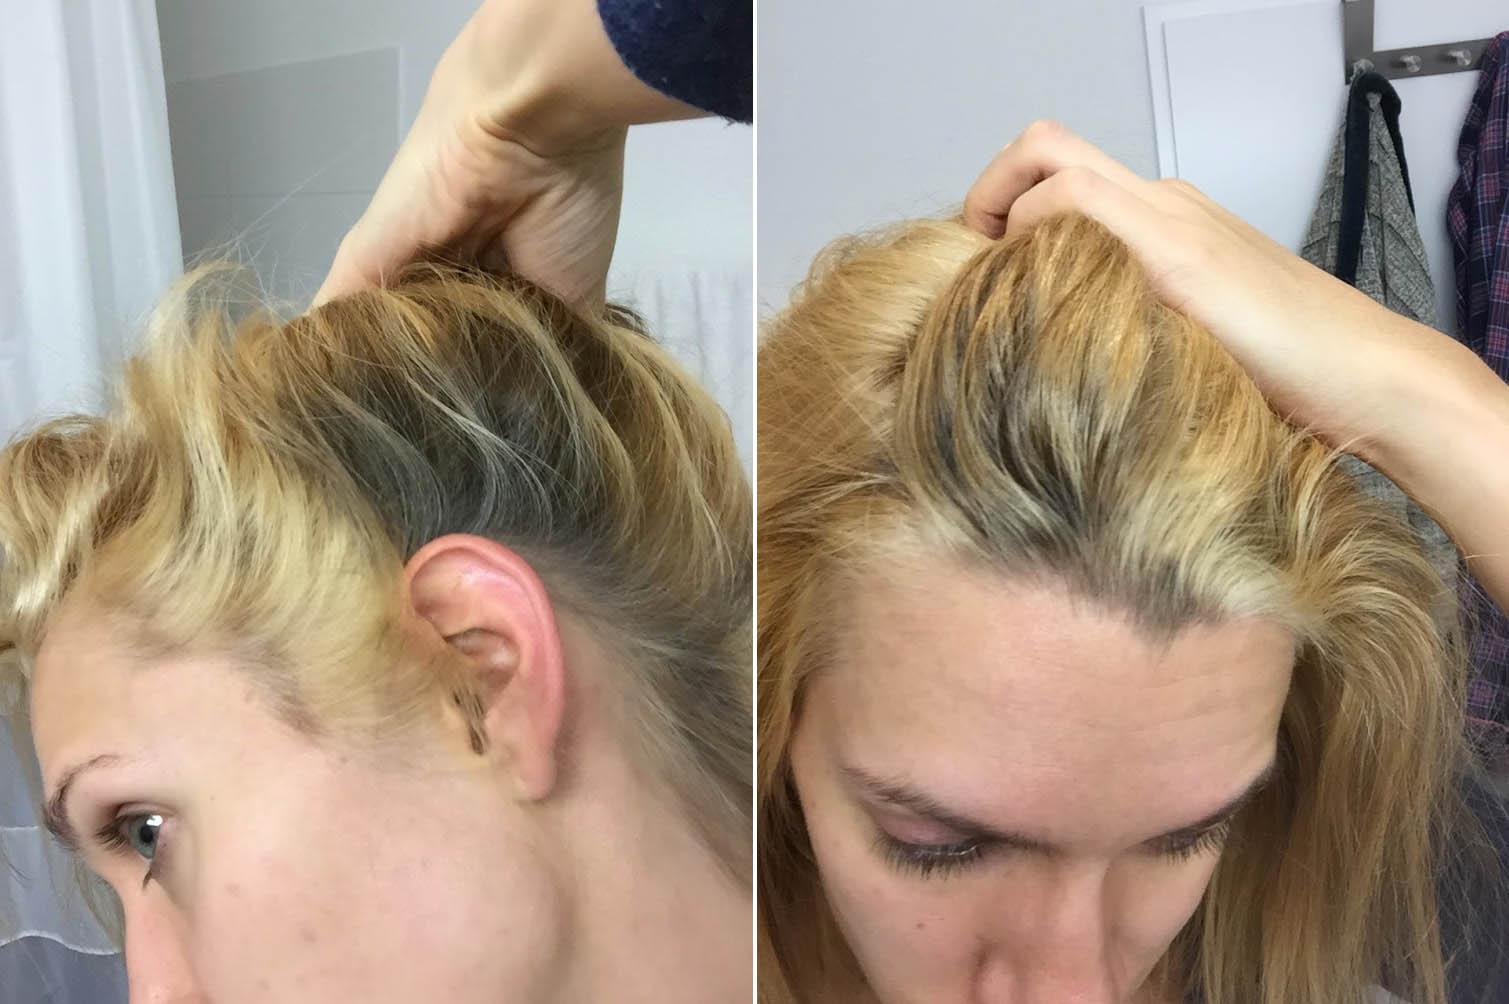 Is Bleaching Natural Hair Bad